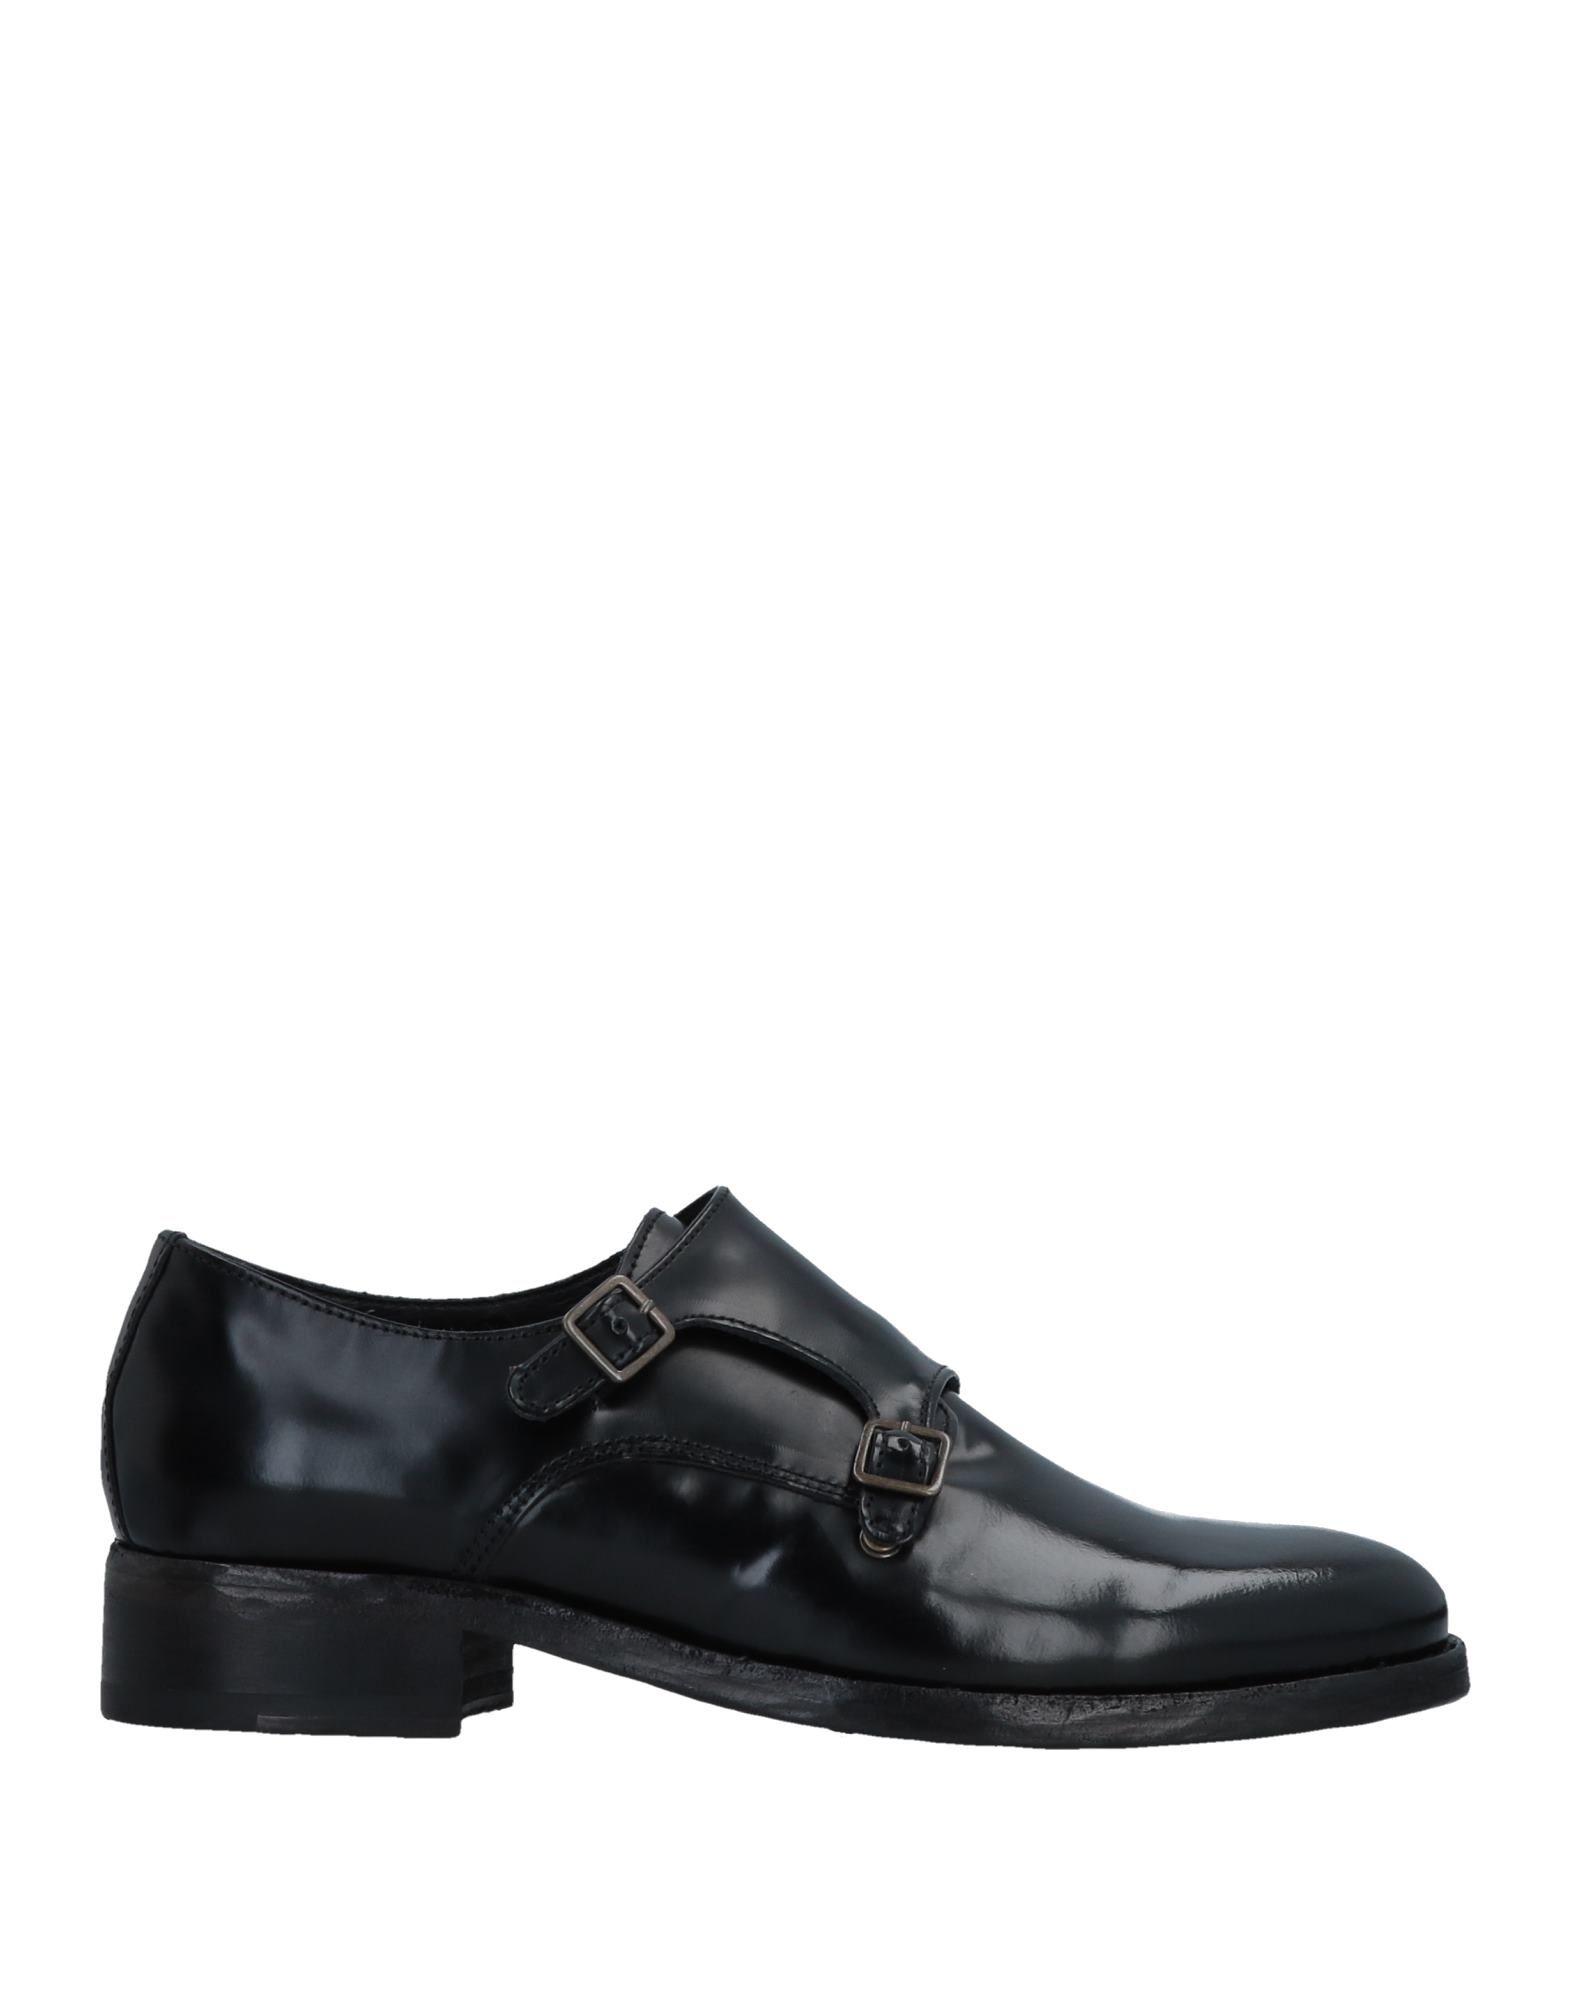 Sneakers Nuove Joshua*S Donna - 11462595KF Nuove Sneakers offerte e scarpe comode 060faf